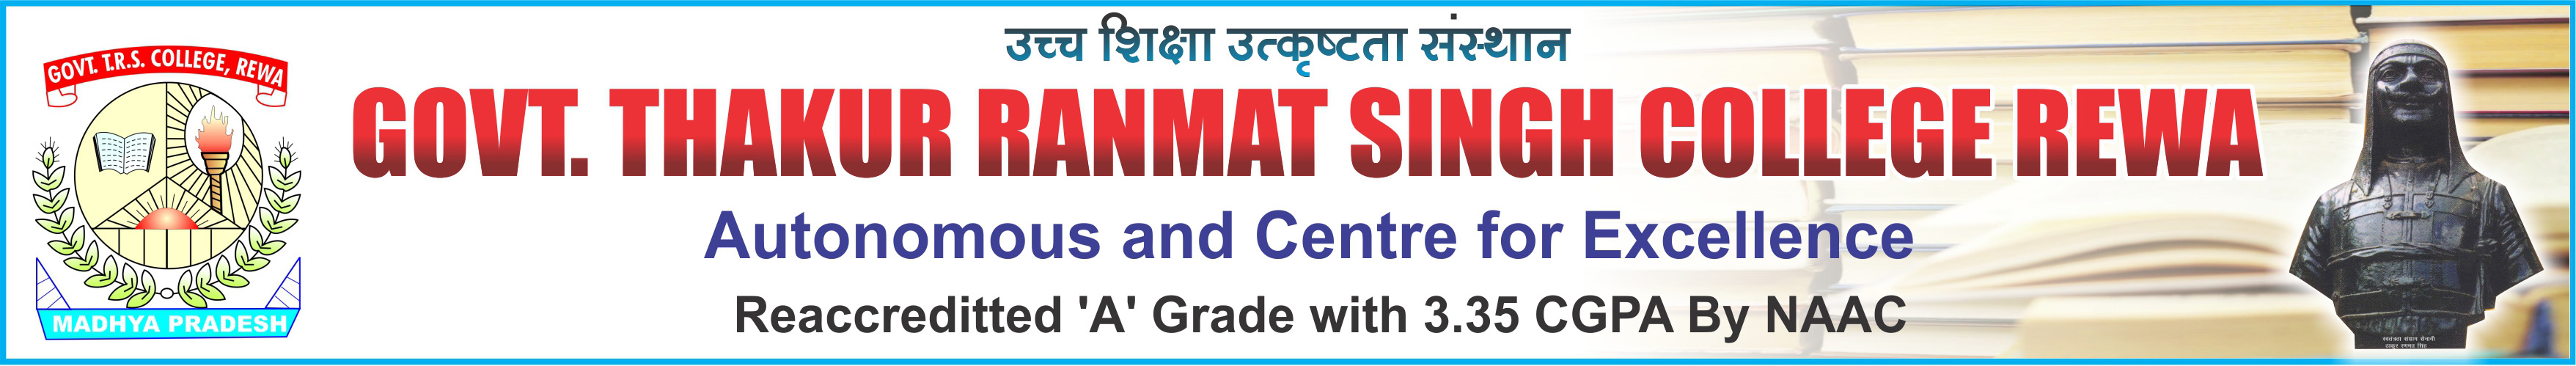 Online Services of Govt  T R S  College, Rewa (M P )